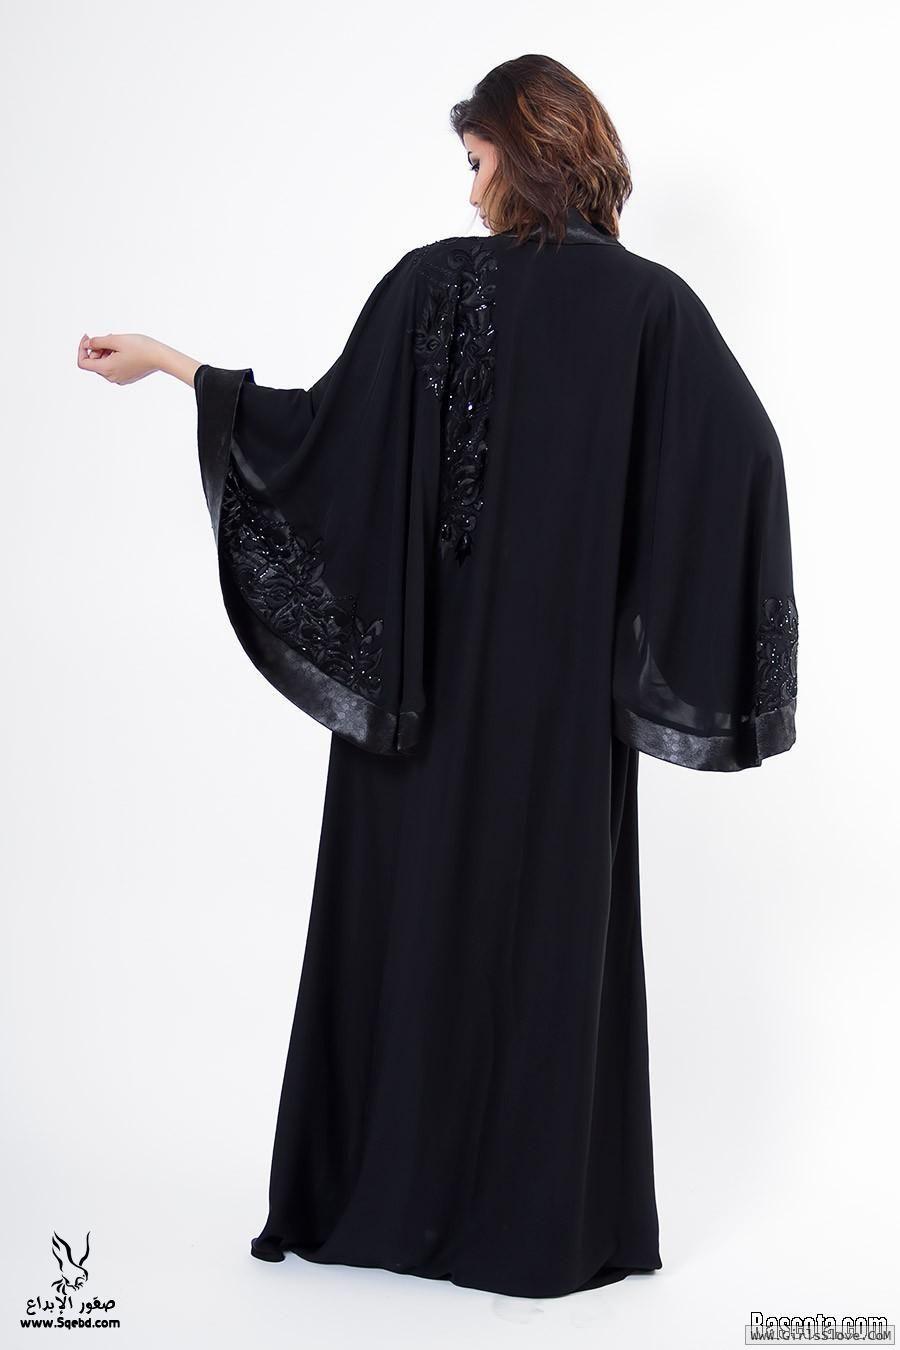 ������ ���� 2016 , ������ ���� ���� , ������ ���� ��� ����� ������ - ����� 2016 - Fashion veiled 2013_1372567763_585.